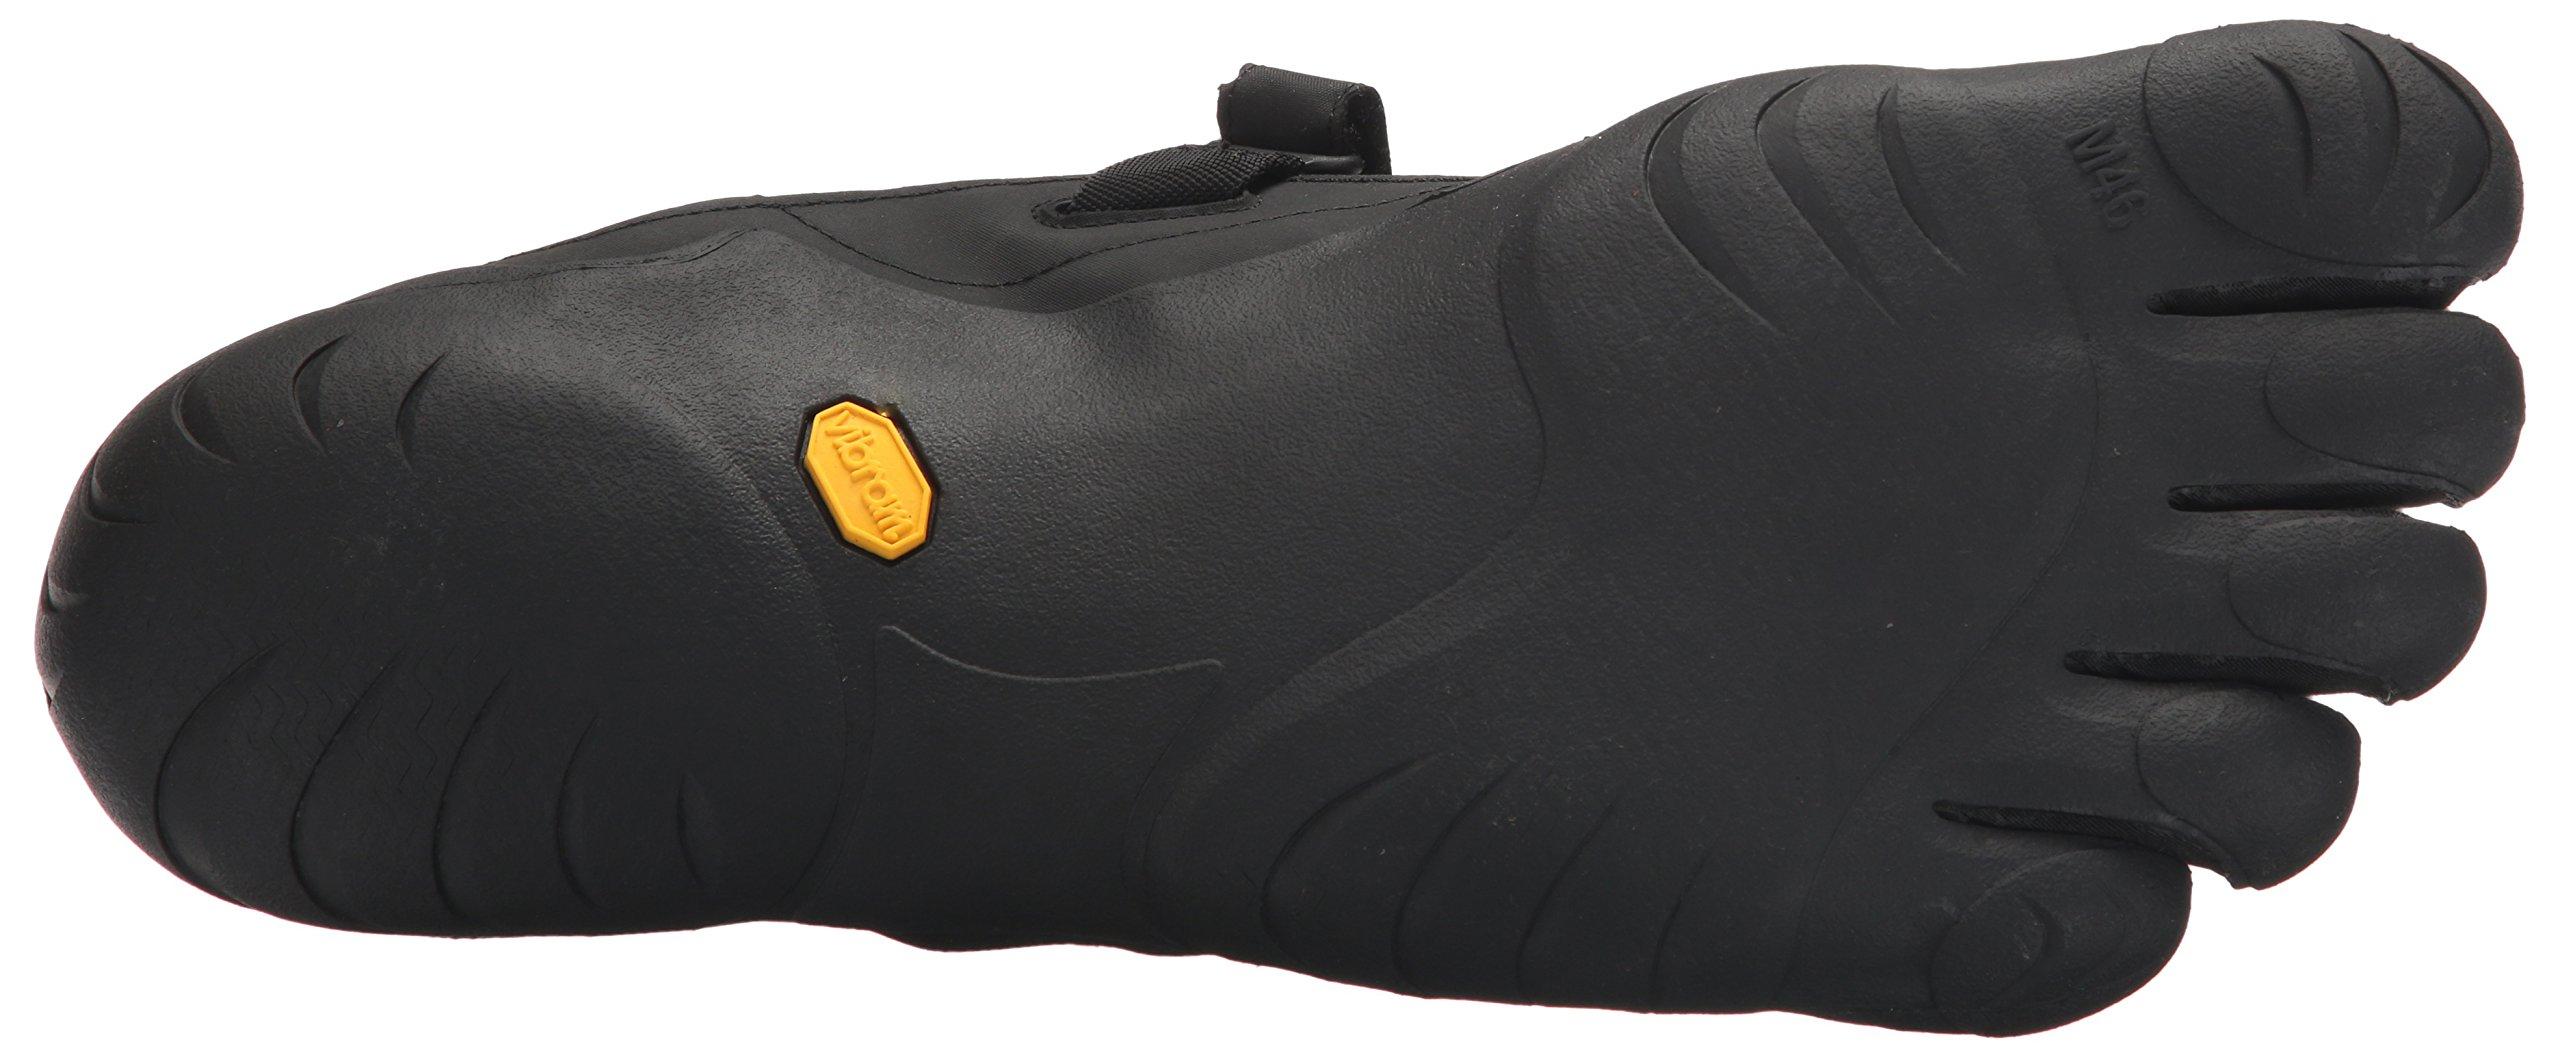 Vibram Men's Five Fingers, KSO EVO Cross Training Shoe Black Black 4.4 M by Vibram (Image #3)